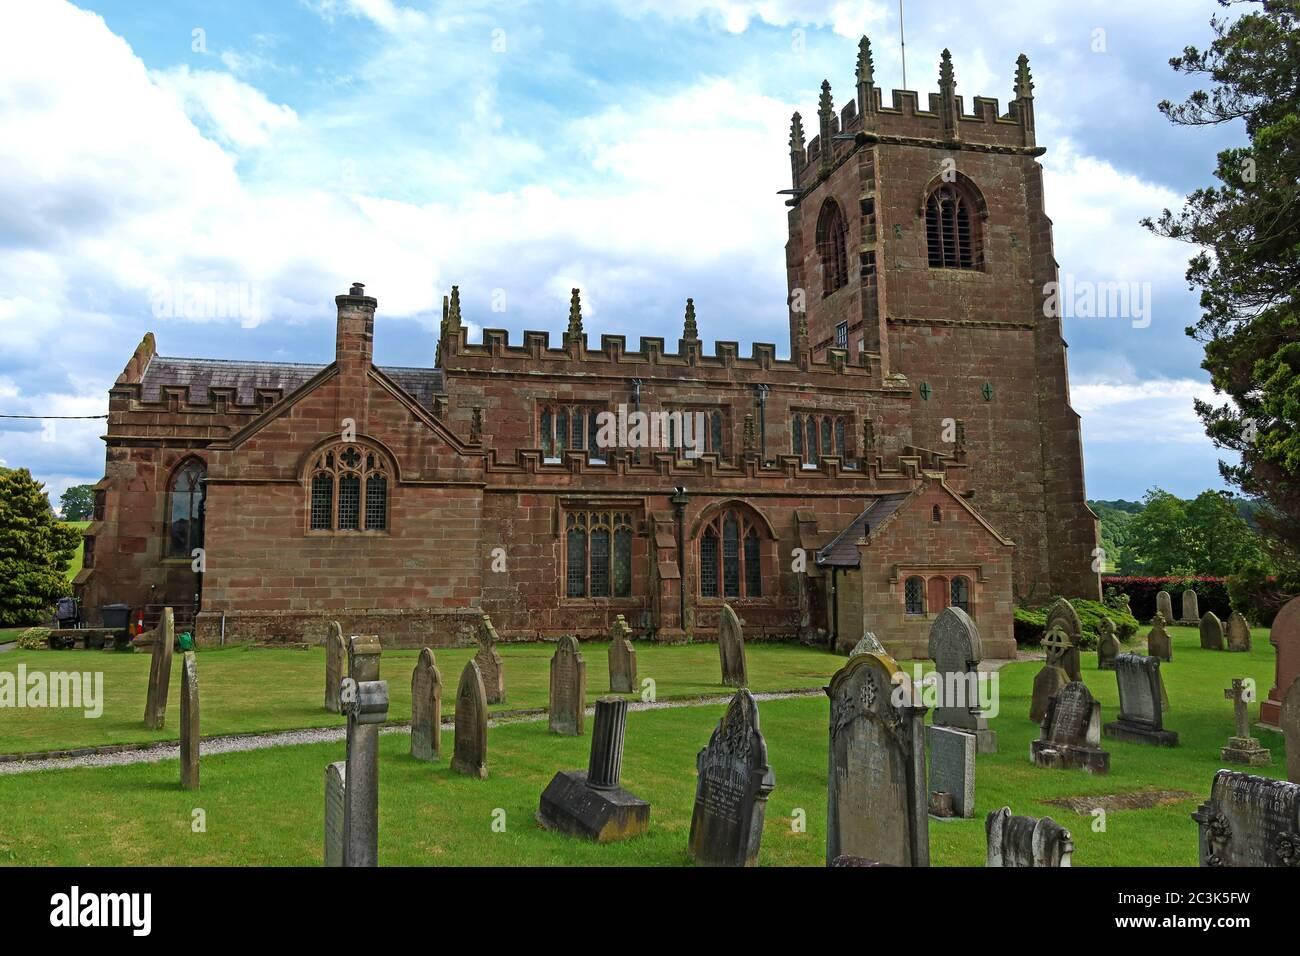 GoTonySmith,HotpixUK,@HotpixUK,SY13,Wirswell Road,Gothic Revival architecture,English Gothic architecture,grade II listed,religion,Anglican,St Michael and All Angels,St Michael & All Angels,parish church,Marbury Parish Church